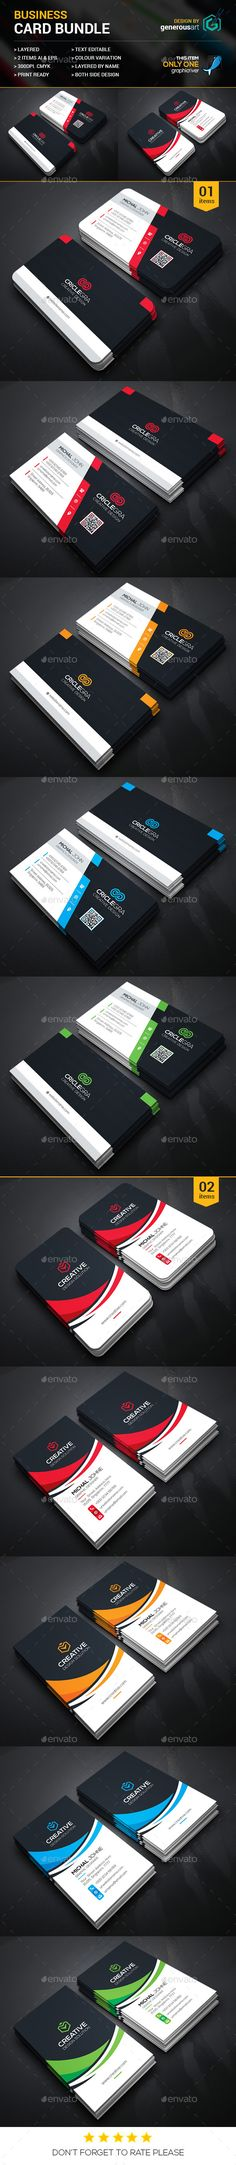 Business Card Bundle 2 in 1 Template PSD #design Download: http://graphicriver.net/item/business-card-bundle-2-in-1_vol42/13437075?ref=ksioks